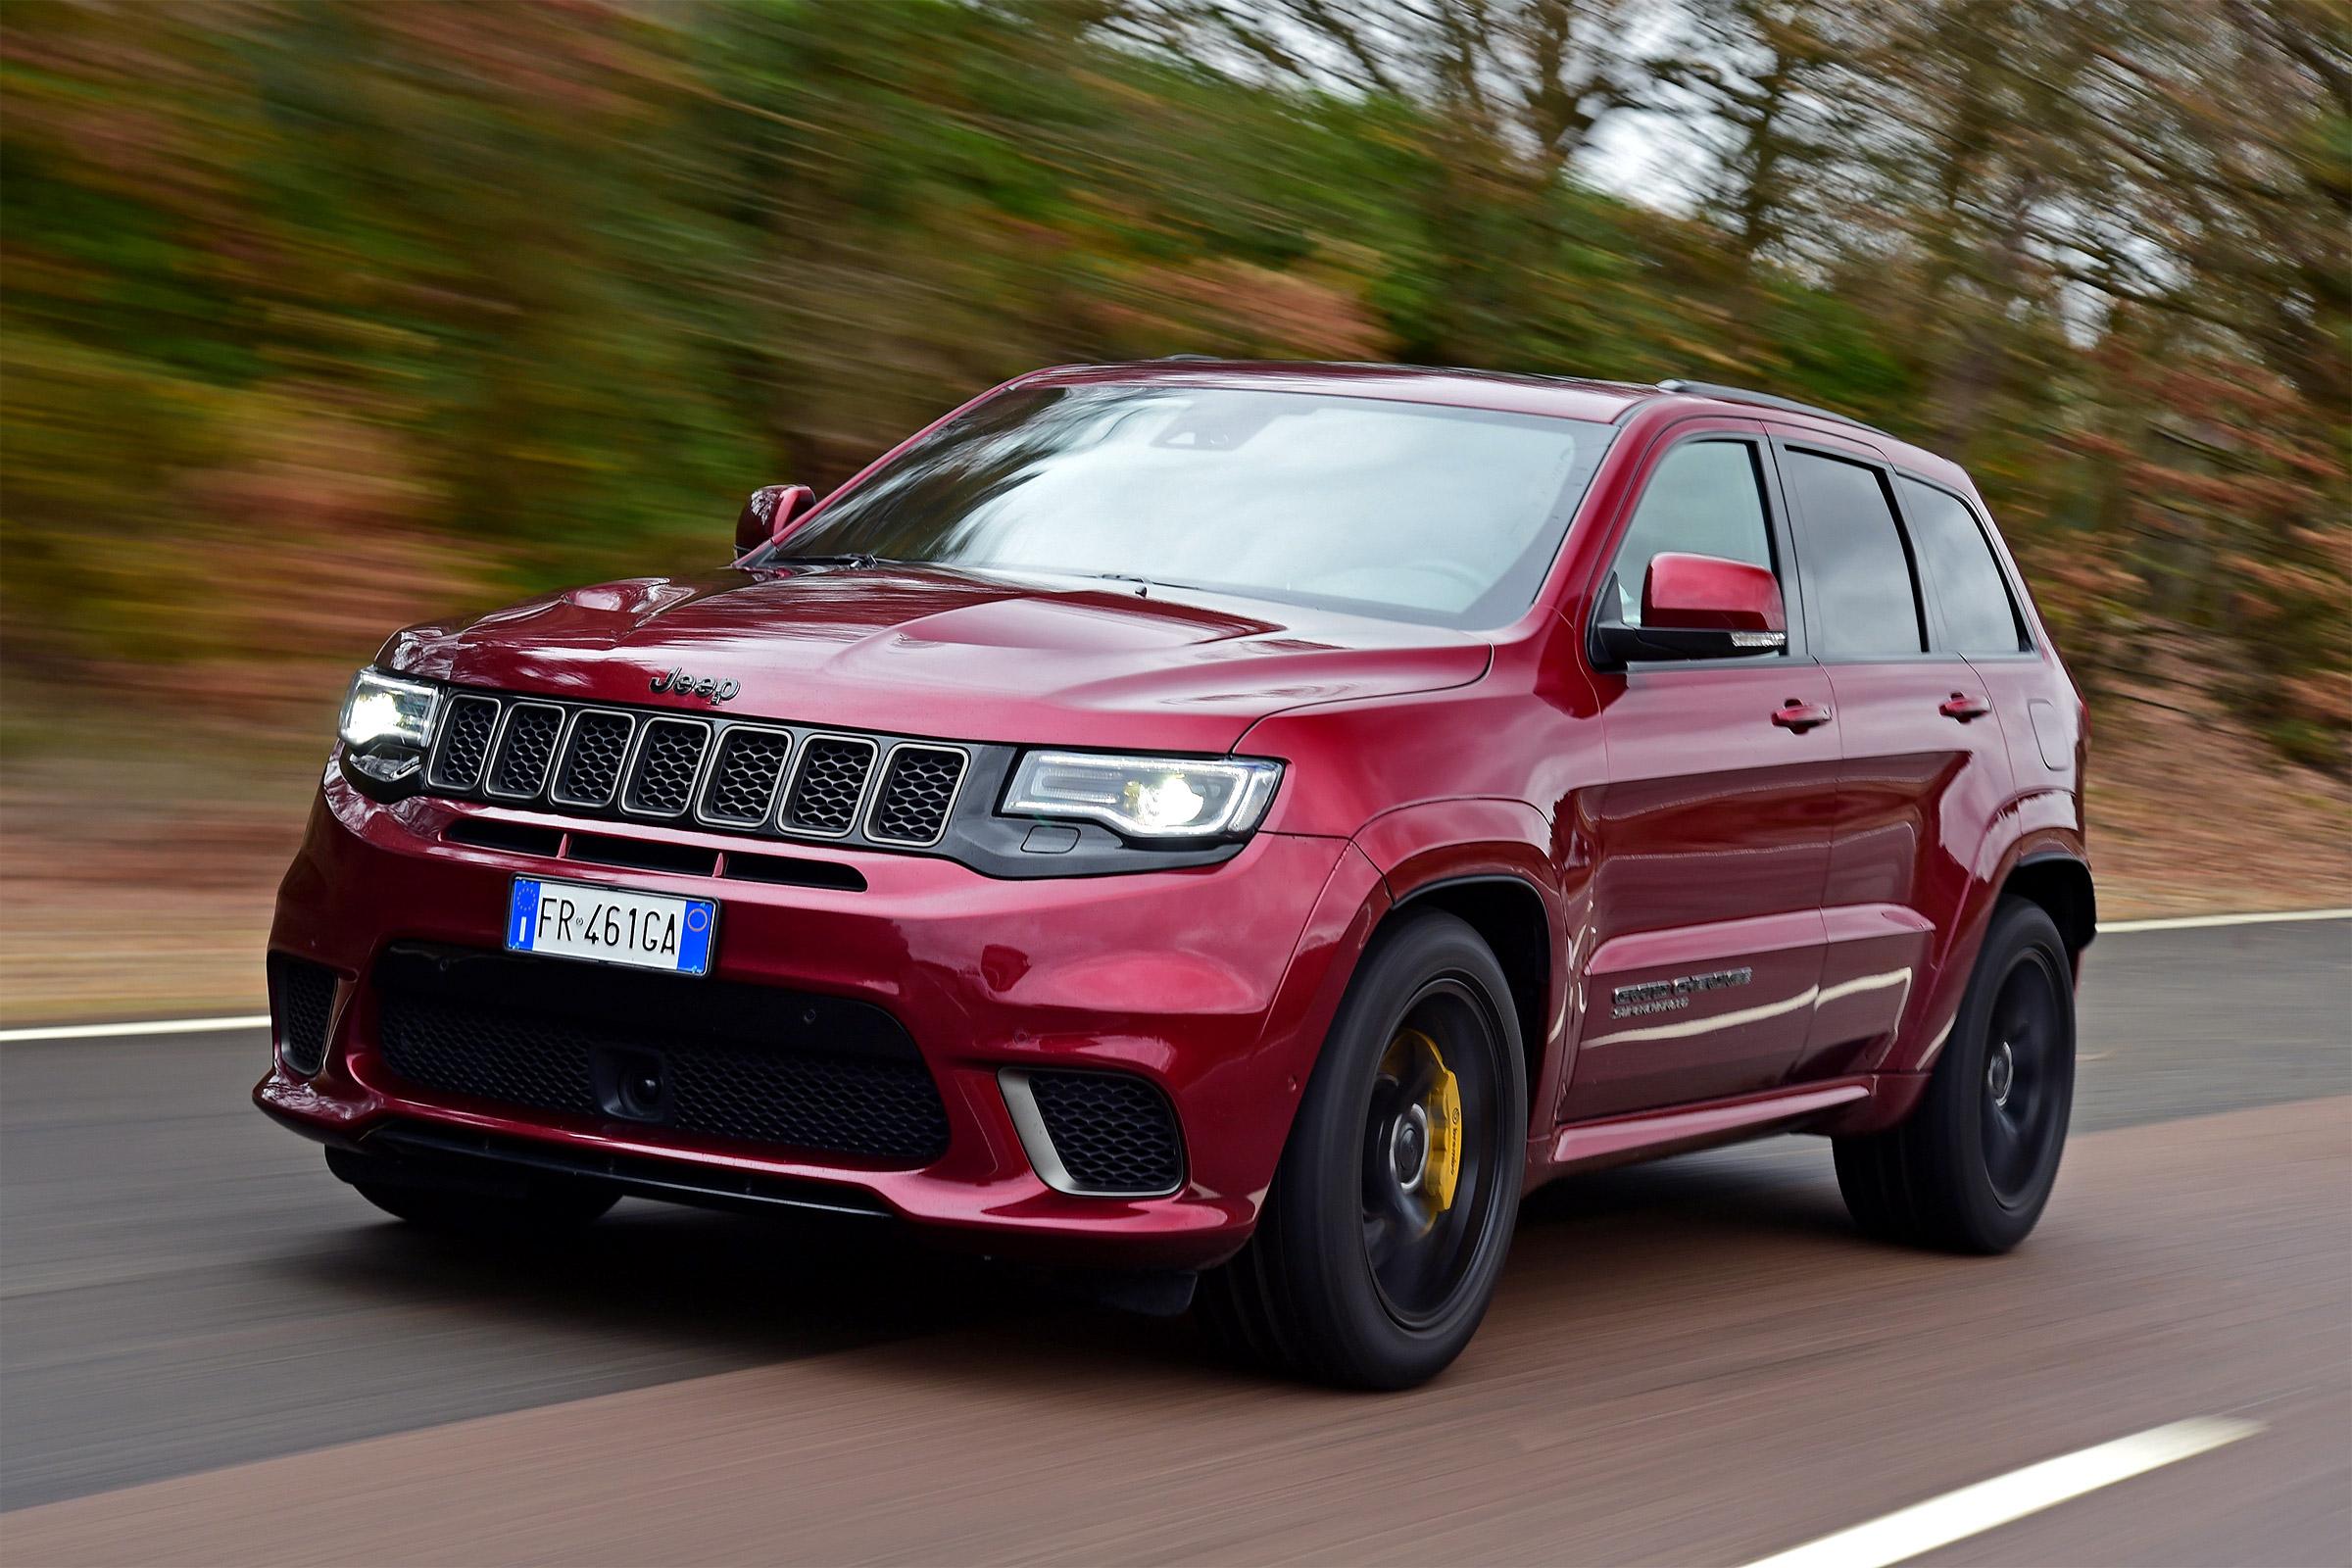 Отзывная компания по Jeep Cherokee объявлена в РФ